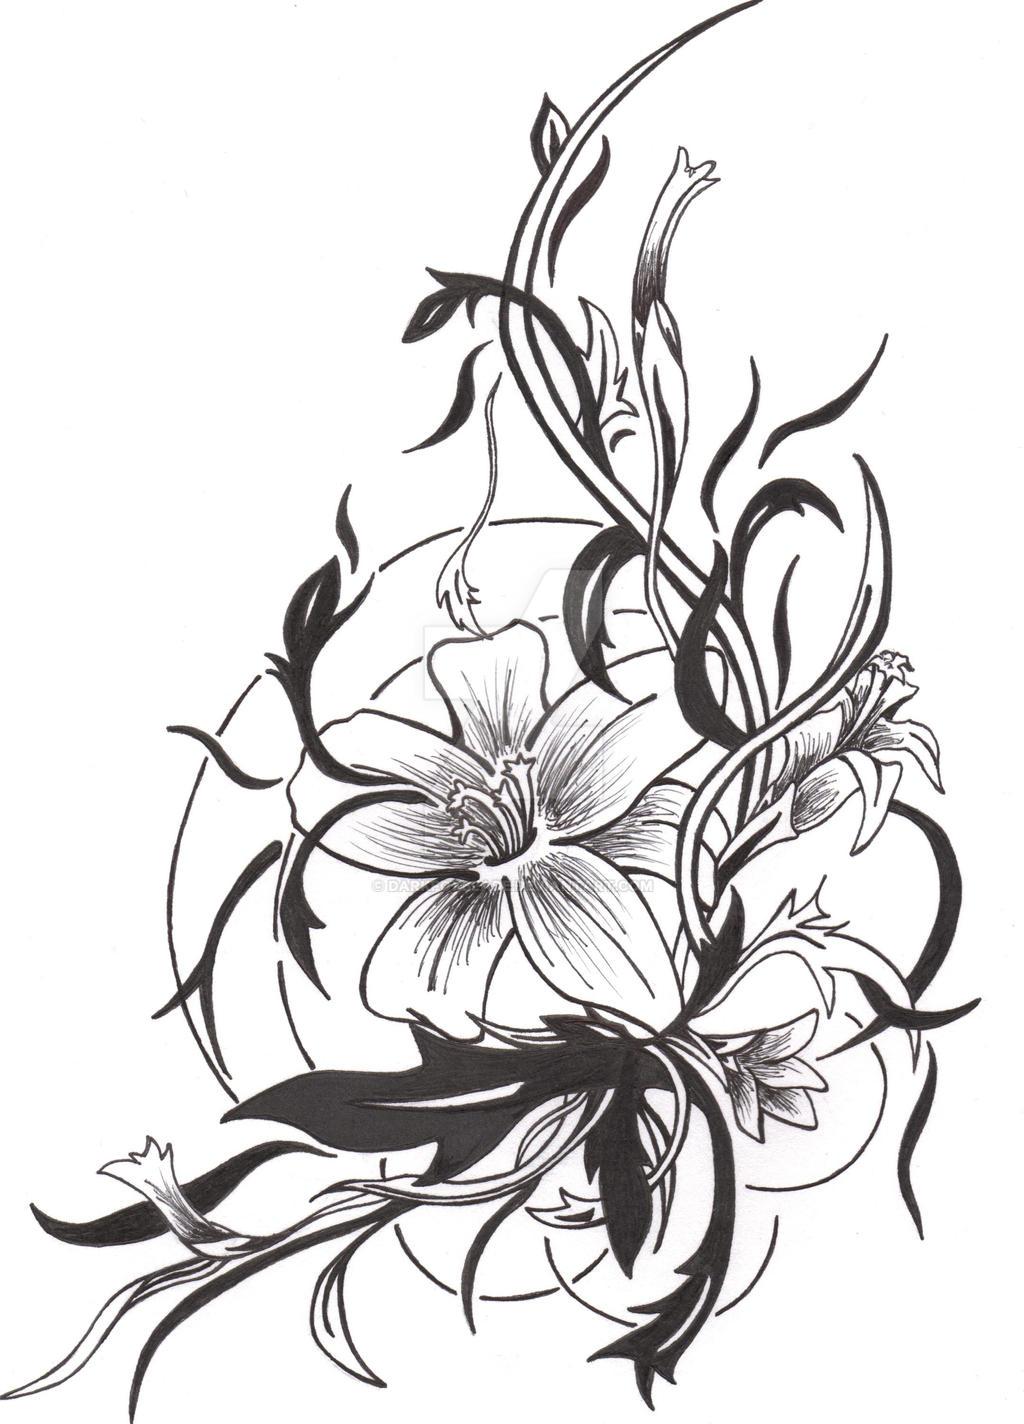 Flower tattoo favourites by femkelannoo on deviantart izmirmasajfo Image collections